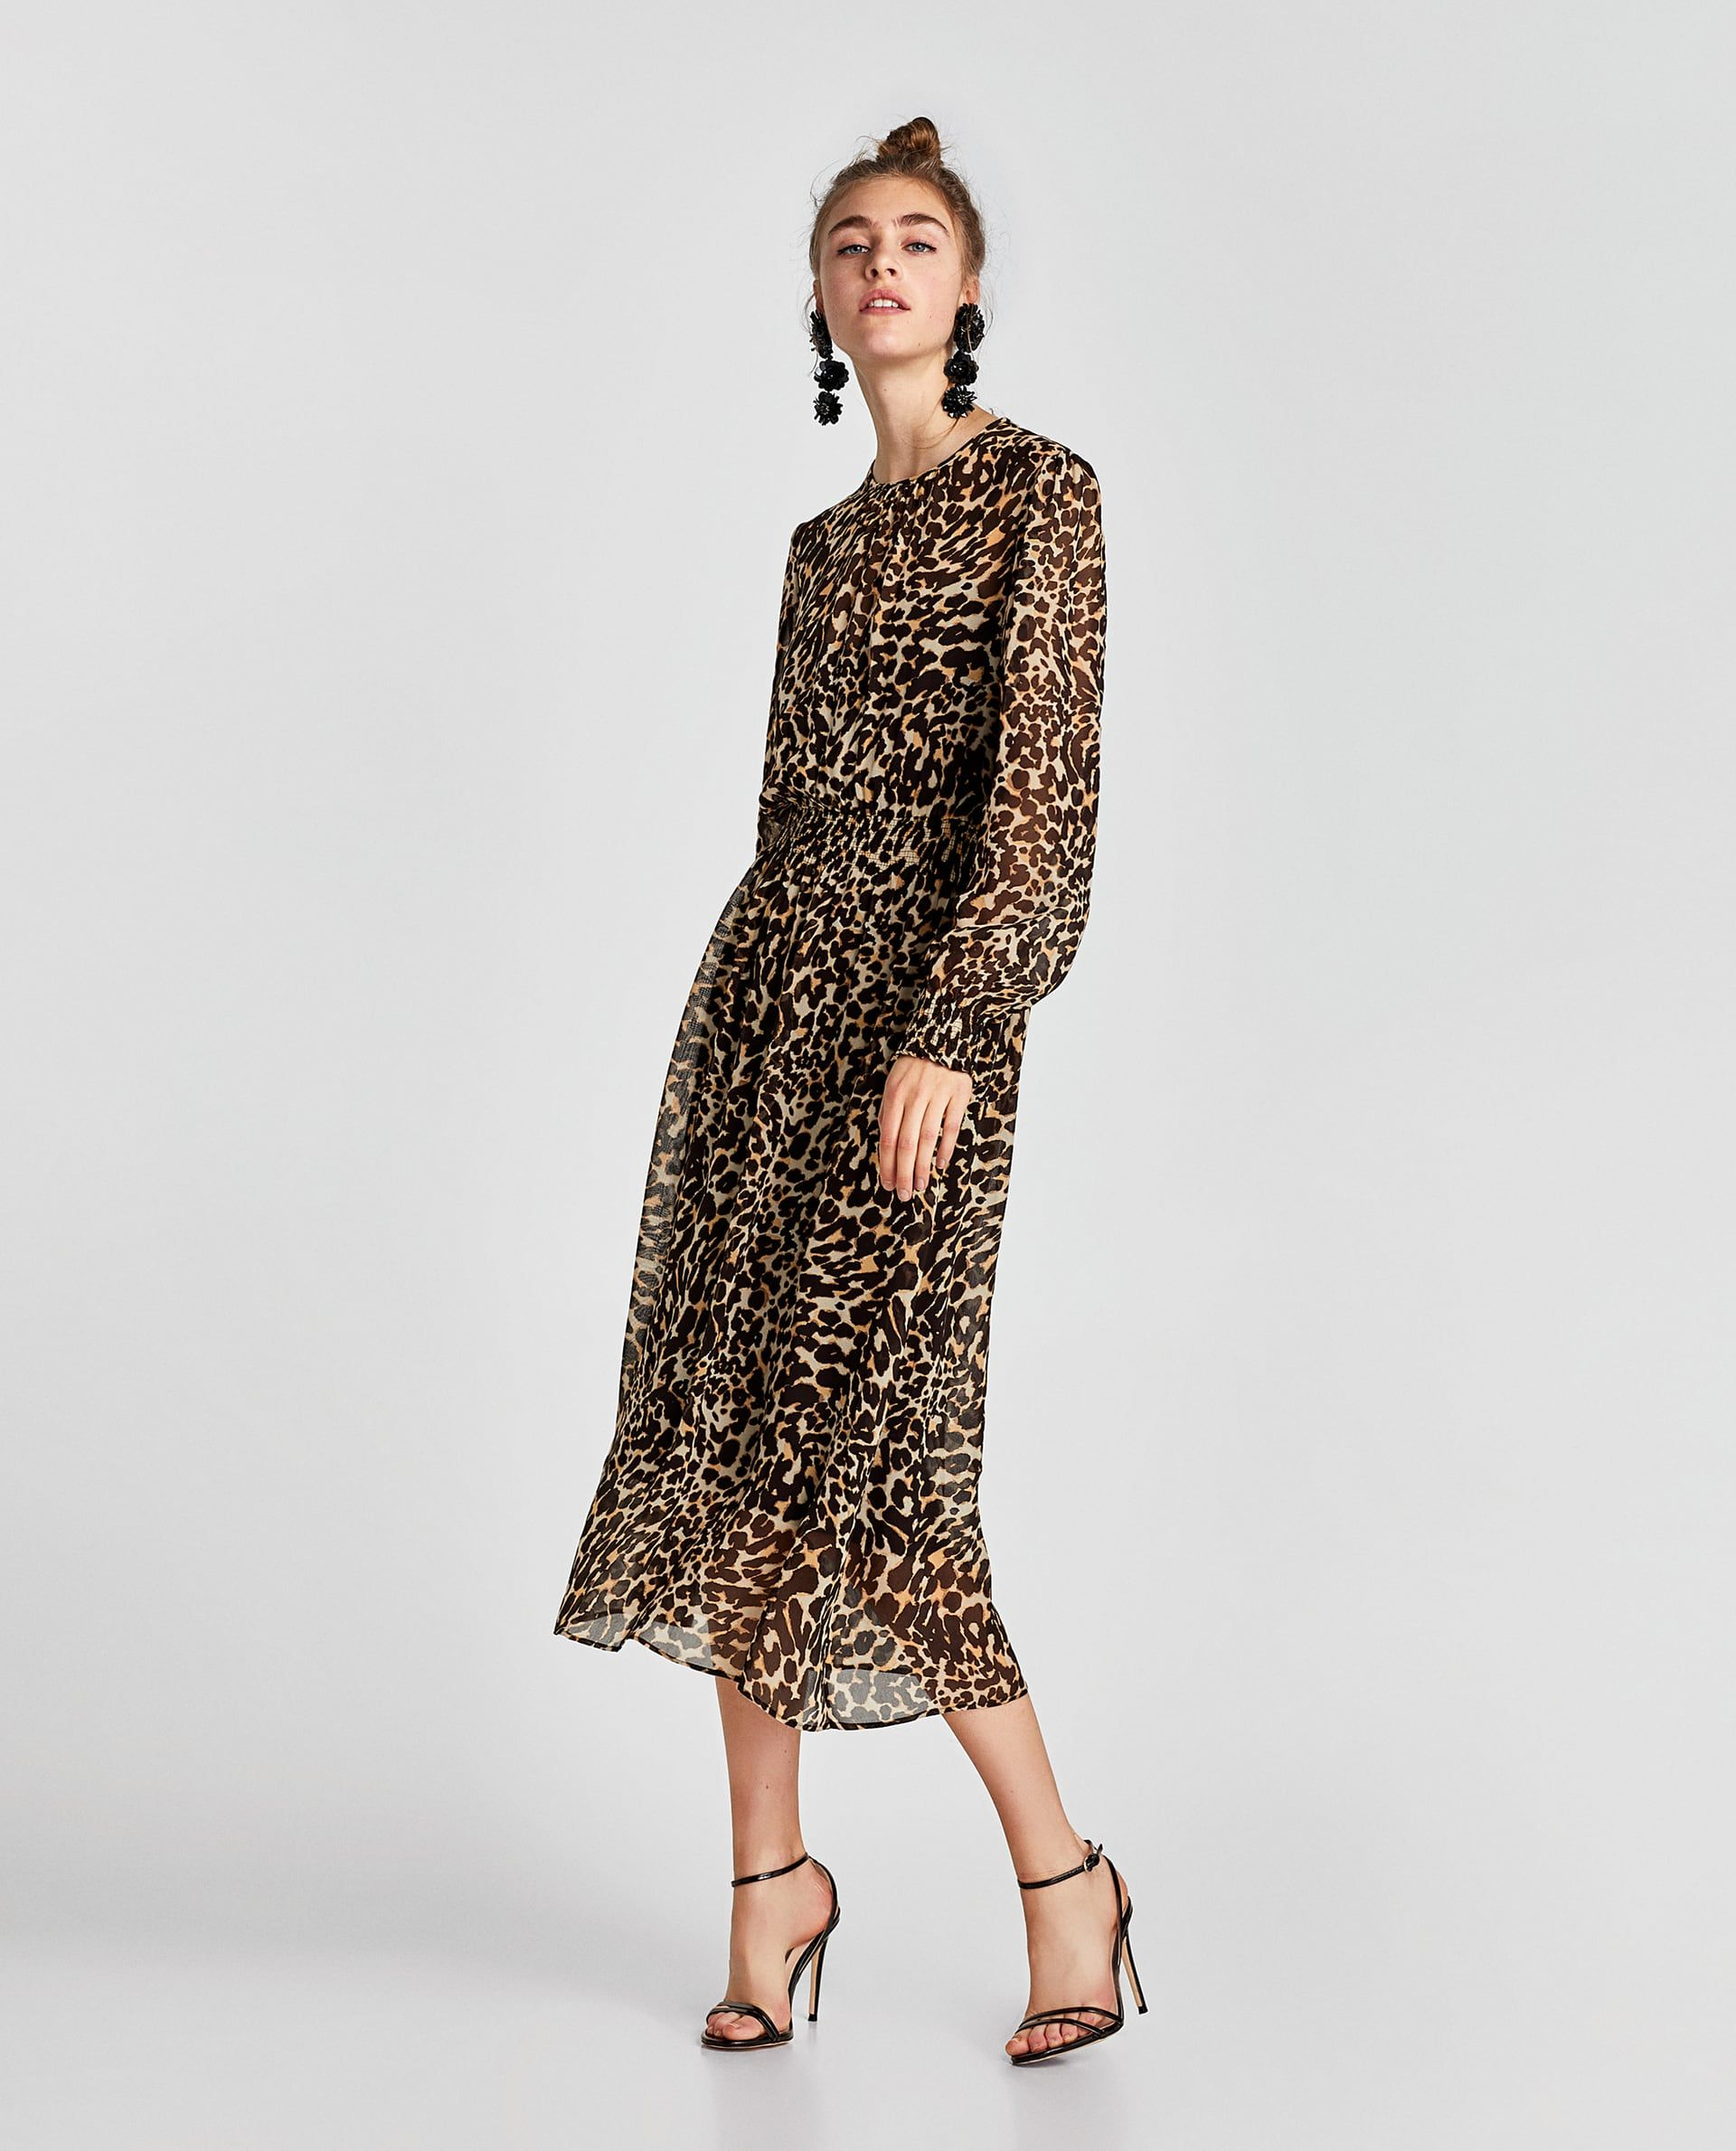 d70cd7272b13d7 ZARA - WOMAN - ANIMAL PRINT DRESS